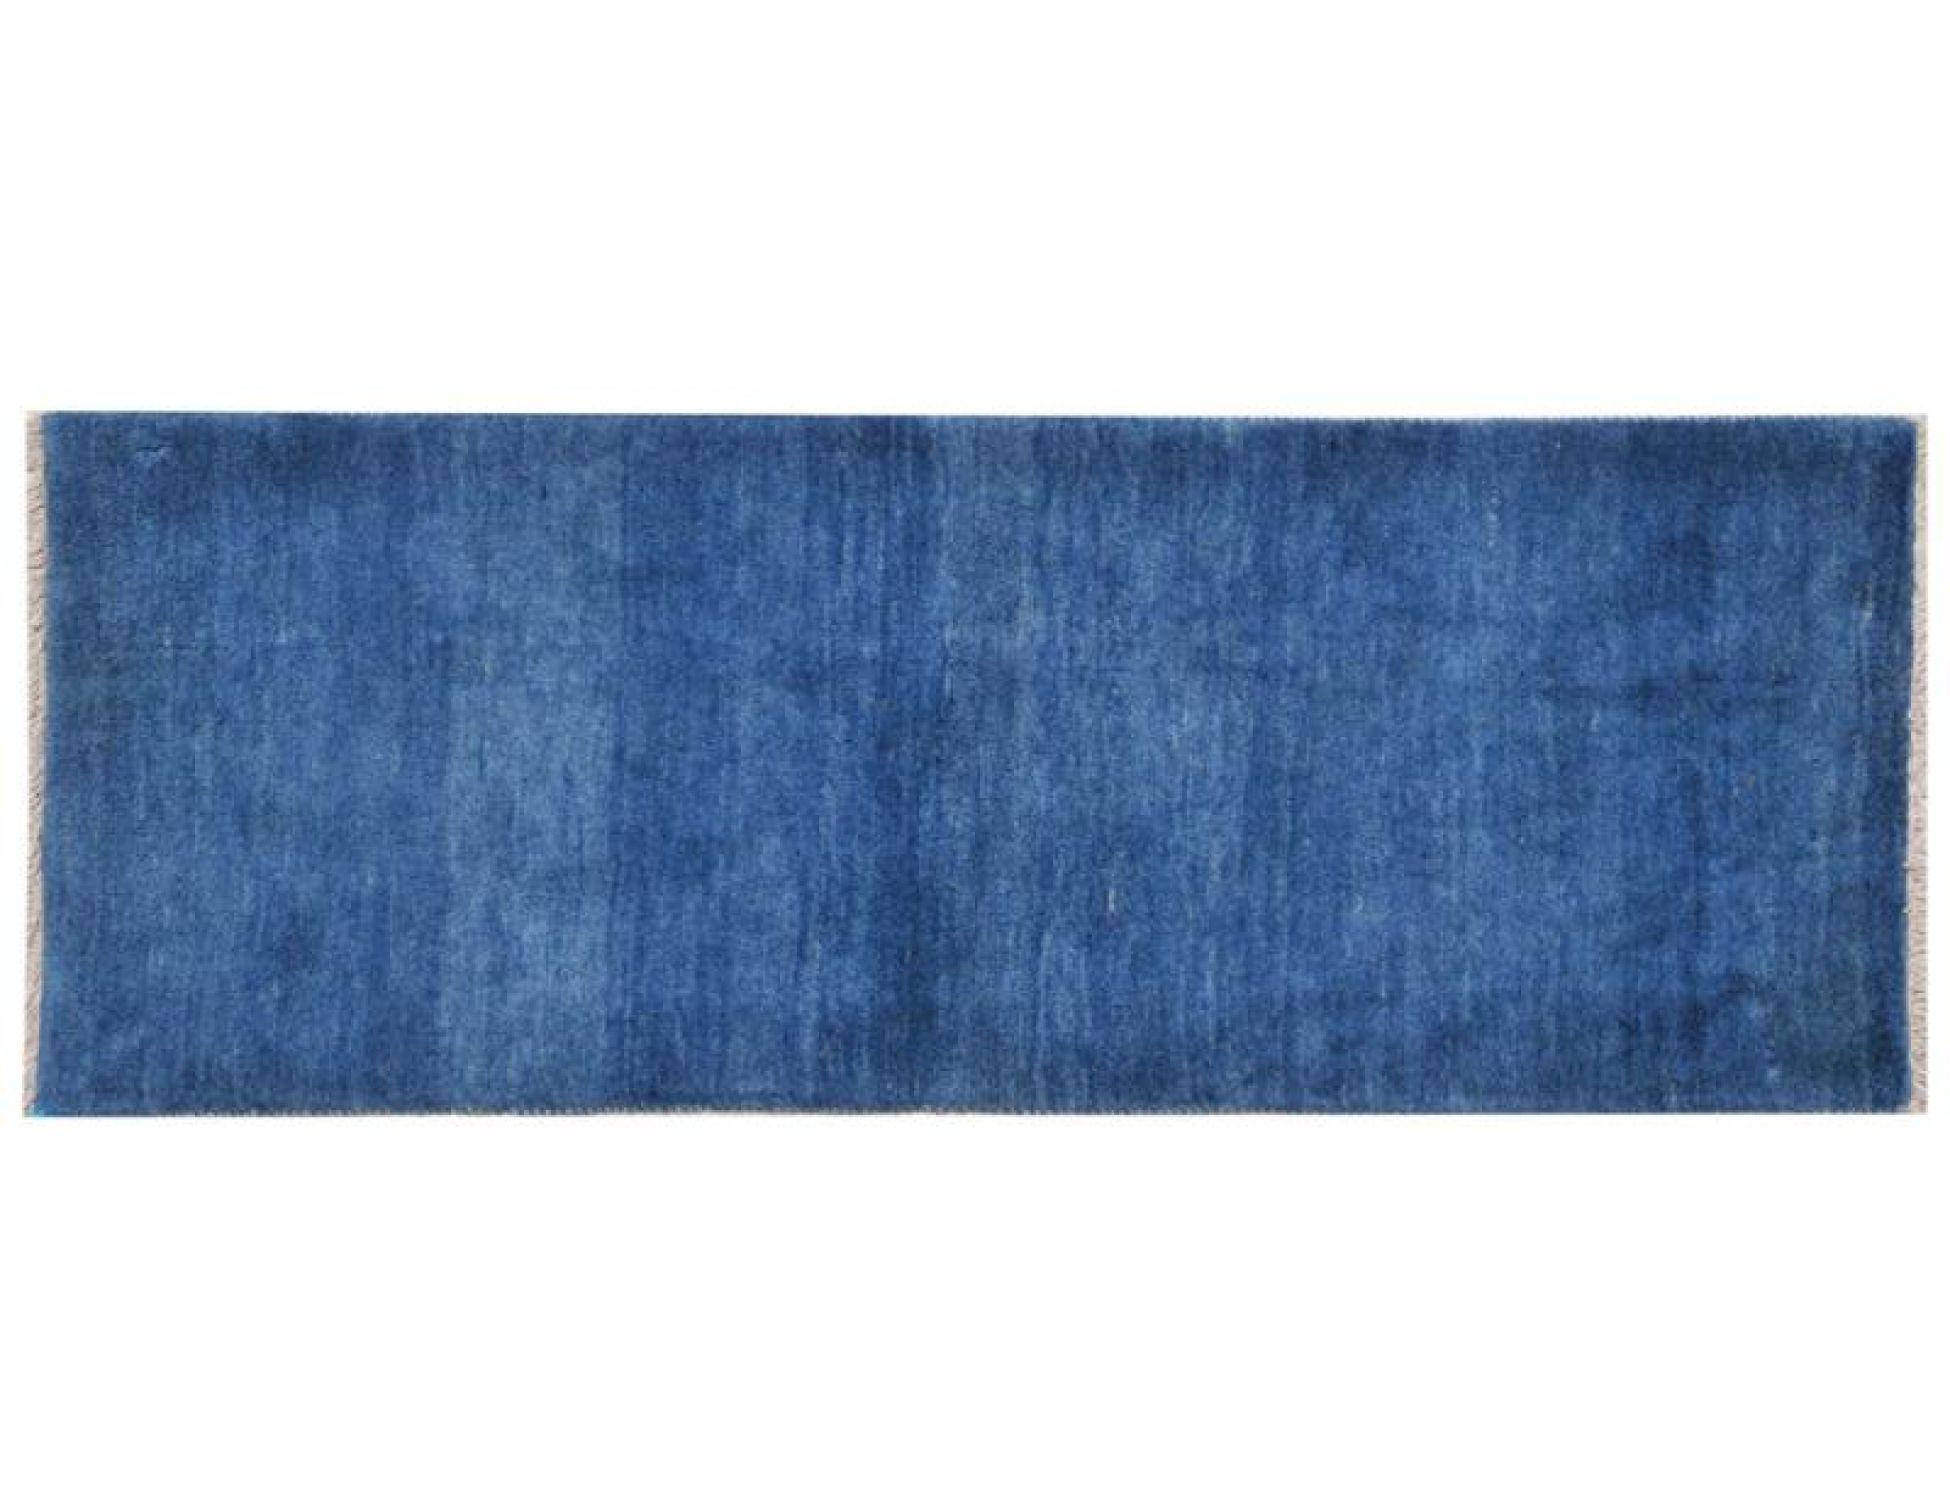 Moderne Teppiche  blau <br/>200 x 73 cm